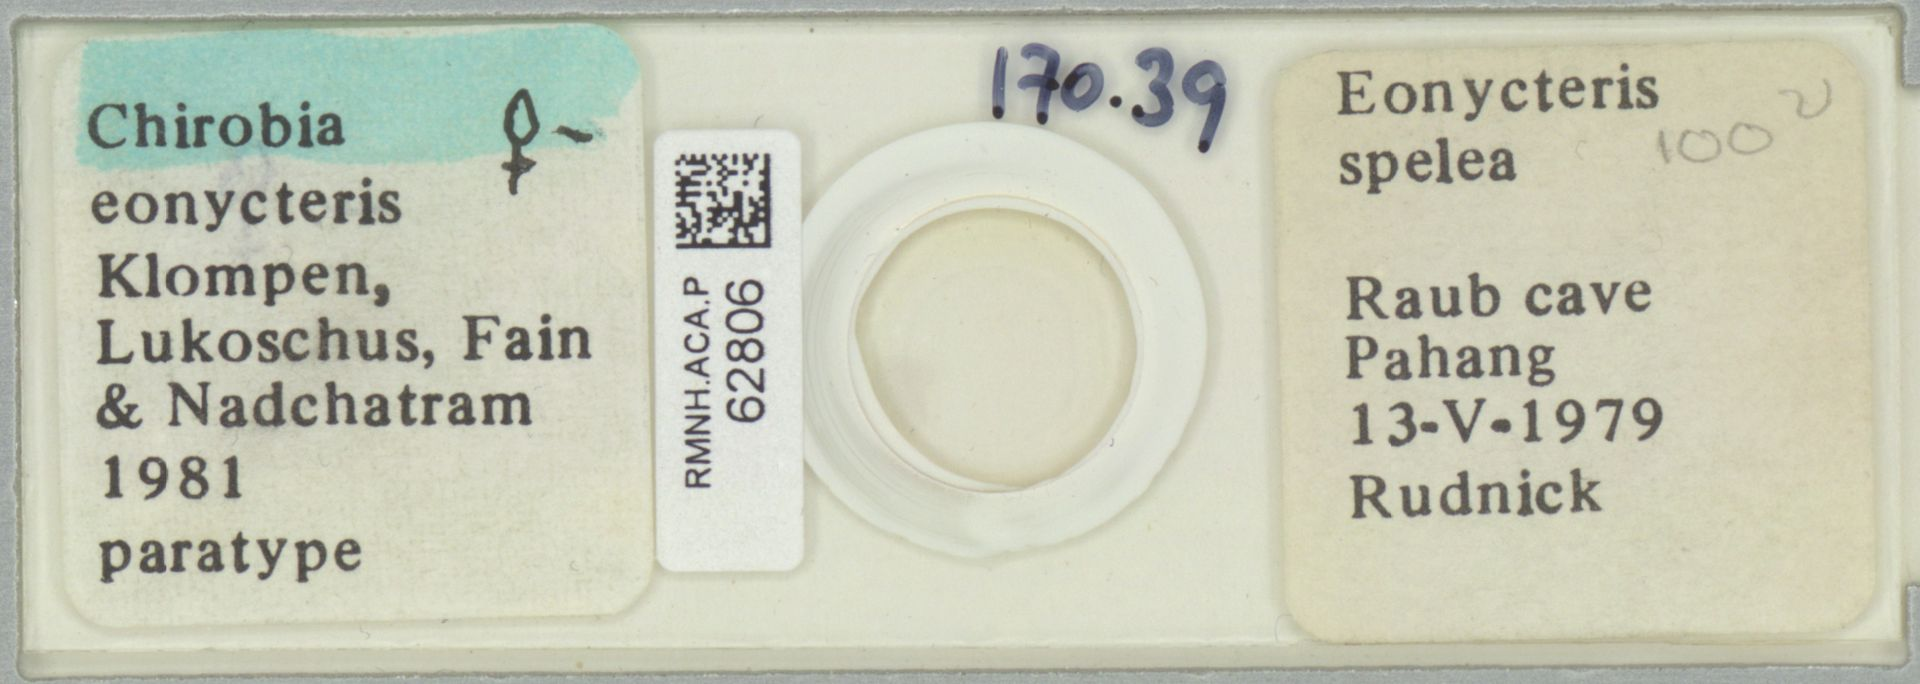 RMNH.ACA.P.62806 | Chirobia eonycteris Klompen, Lukoschus, Fain & Nadchatram, 1981